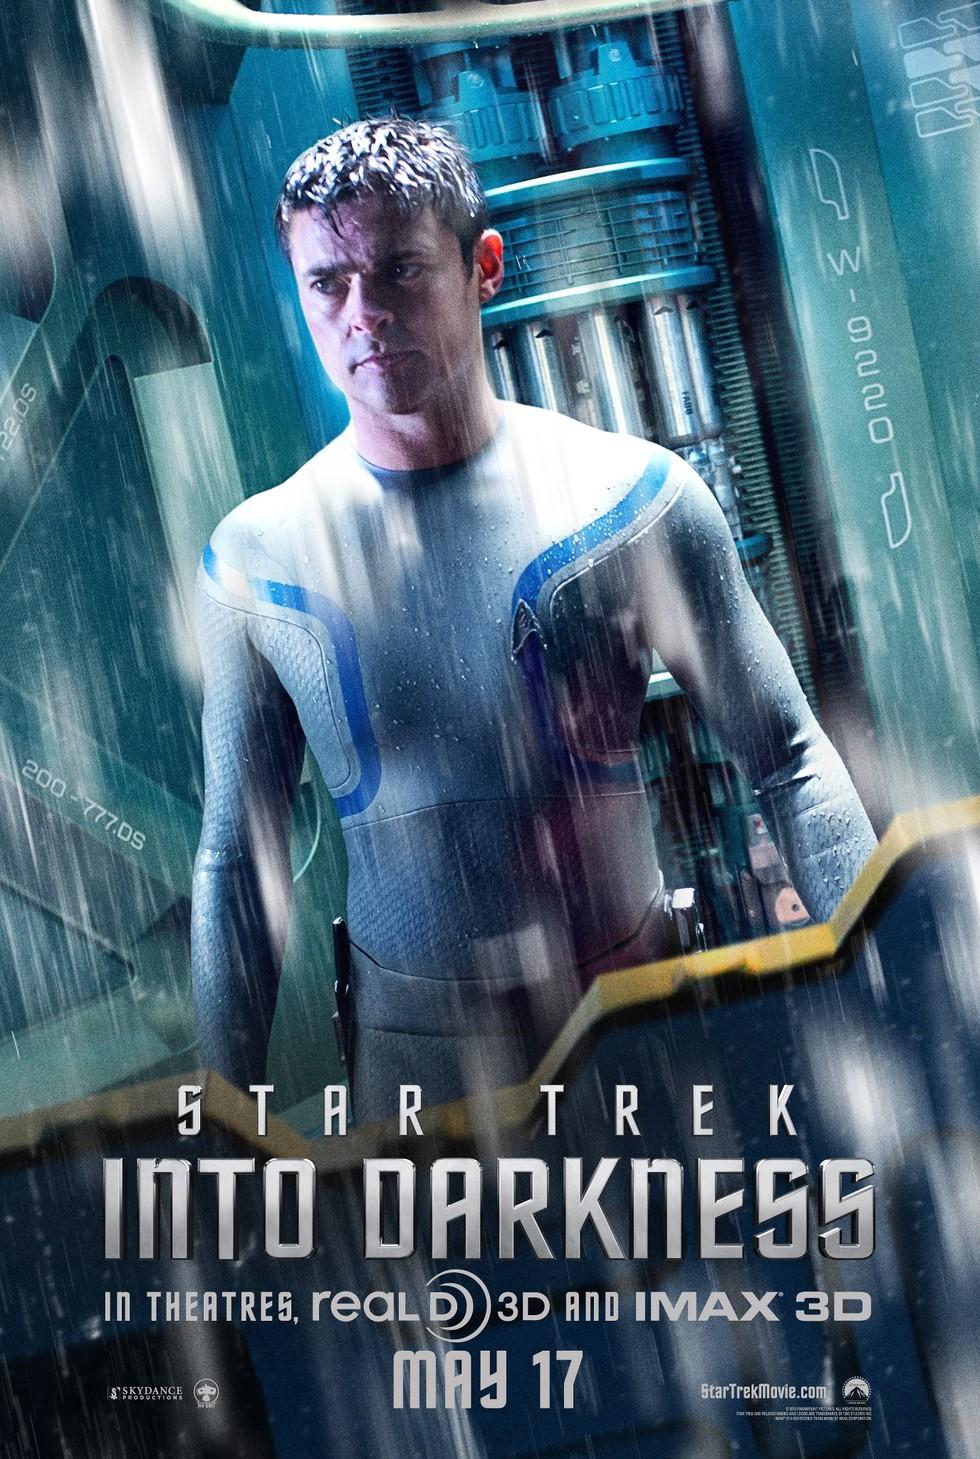 Star Trek Into Darkness - Movie Poster #7 (Large)